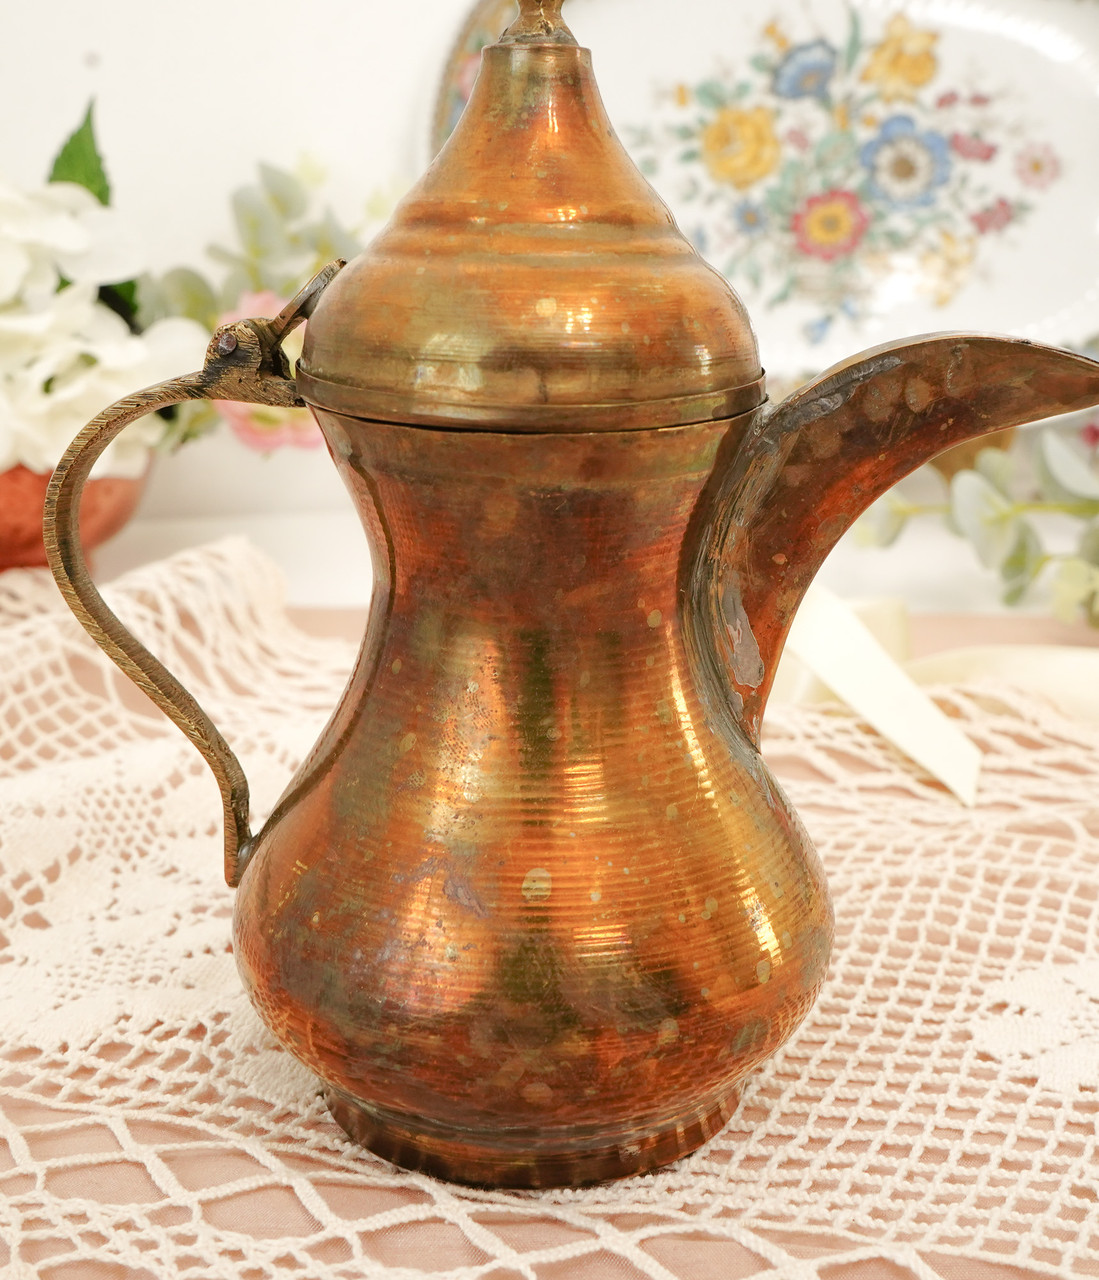 Антикварний арабська кавник, латунний чайник, даллах, латунь, 400 мл